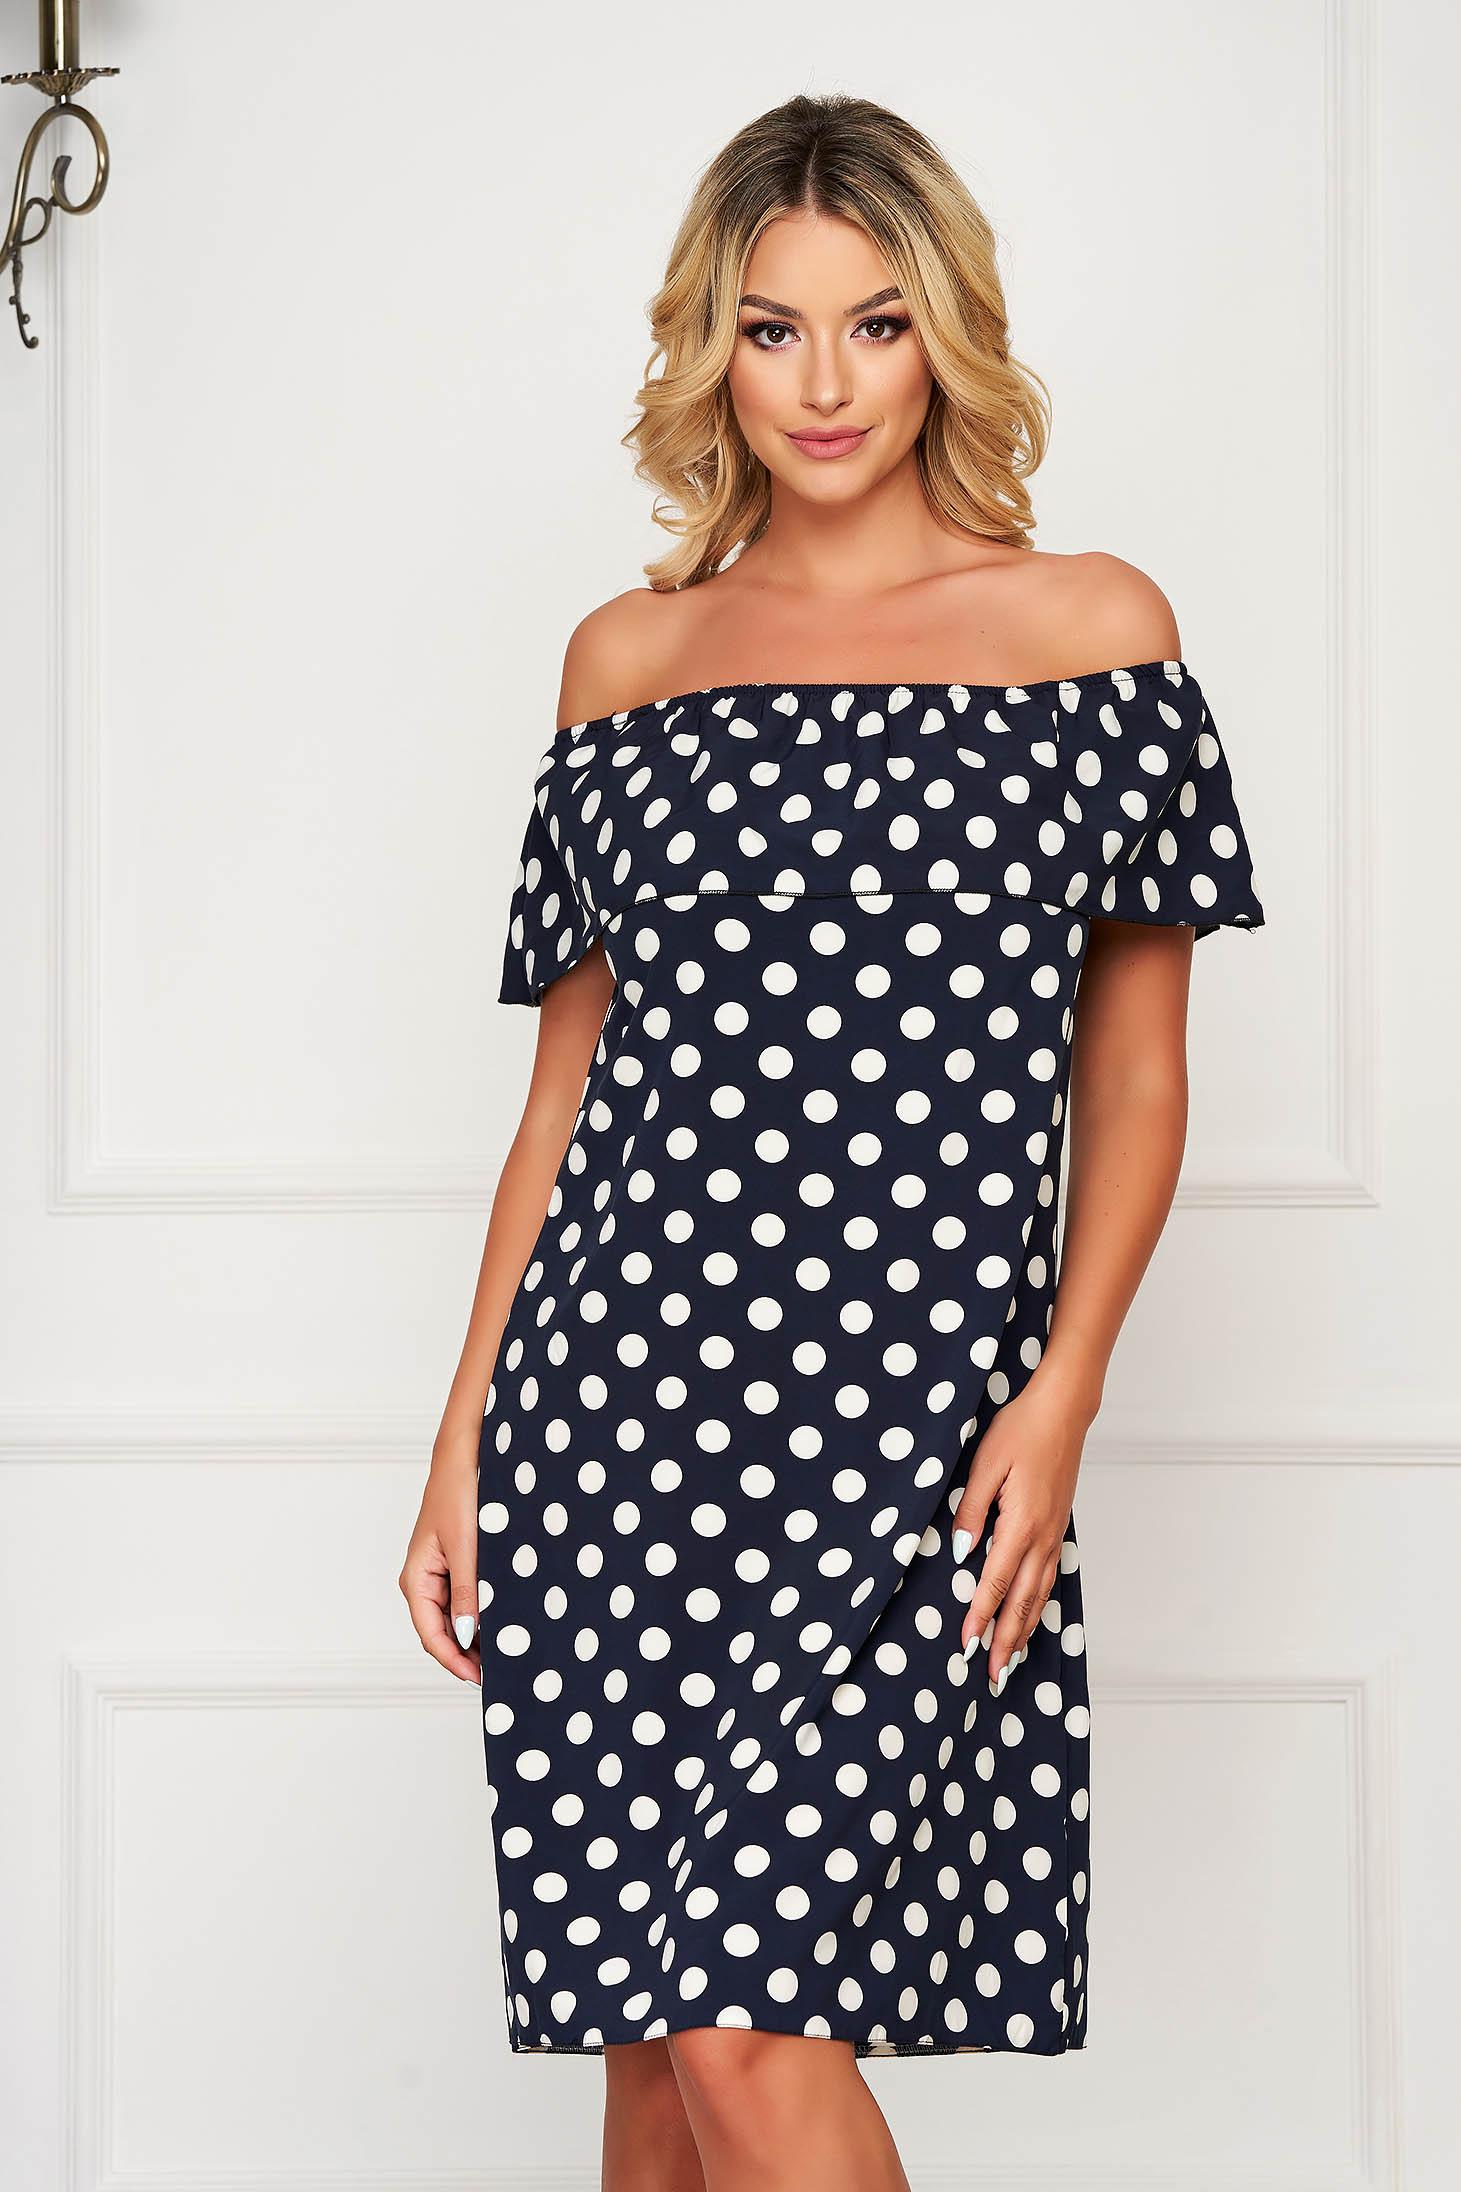 Darkblue dress short cut daily with easy cut thin fabric off-shoulder